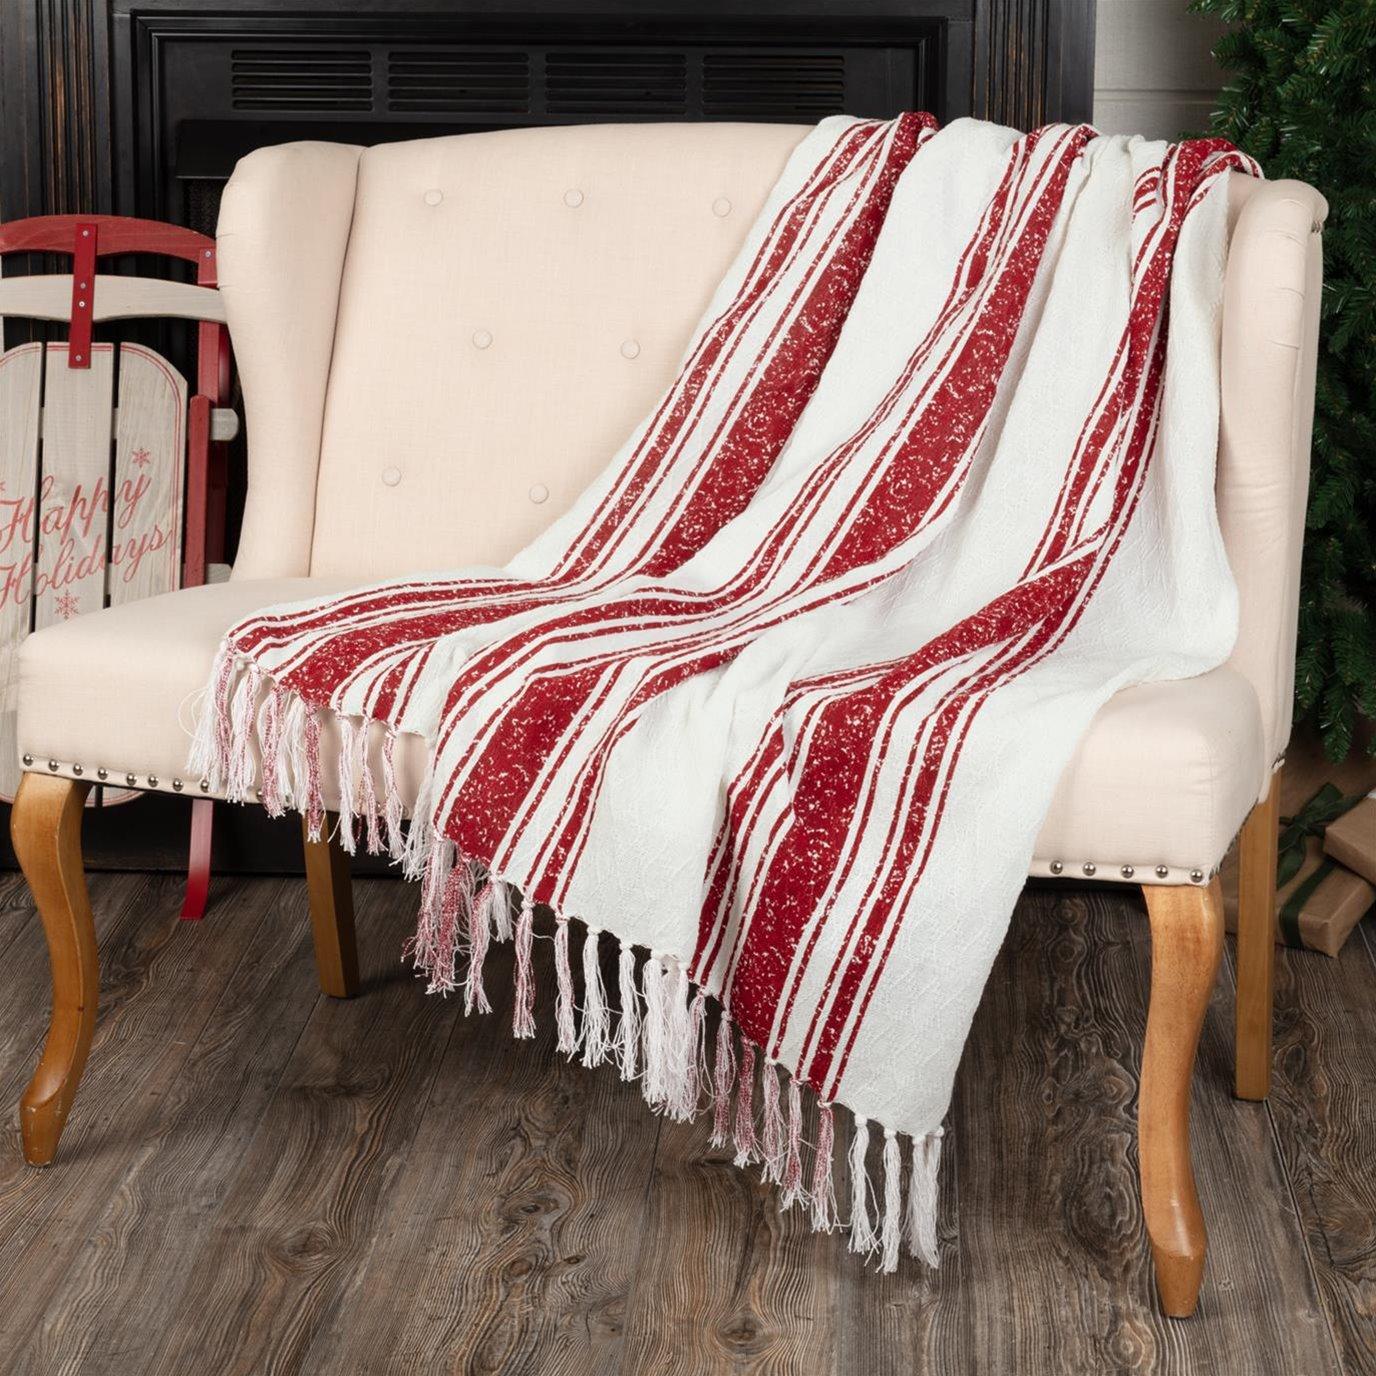 Antique Red Stripe Woven Throw 60x50